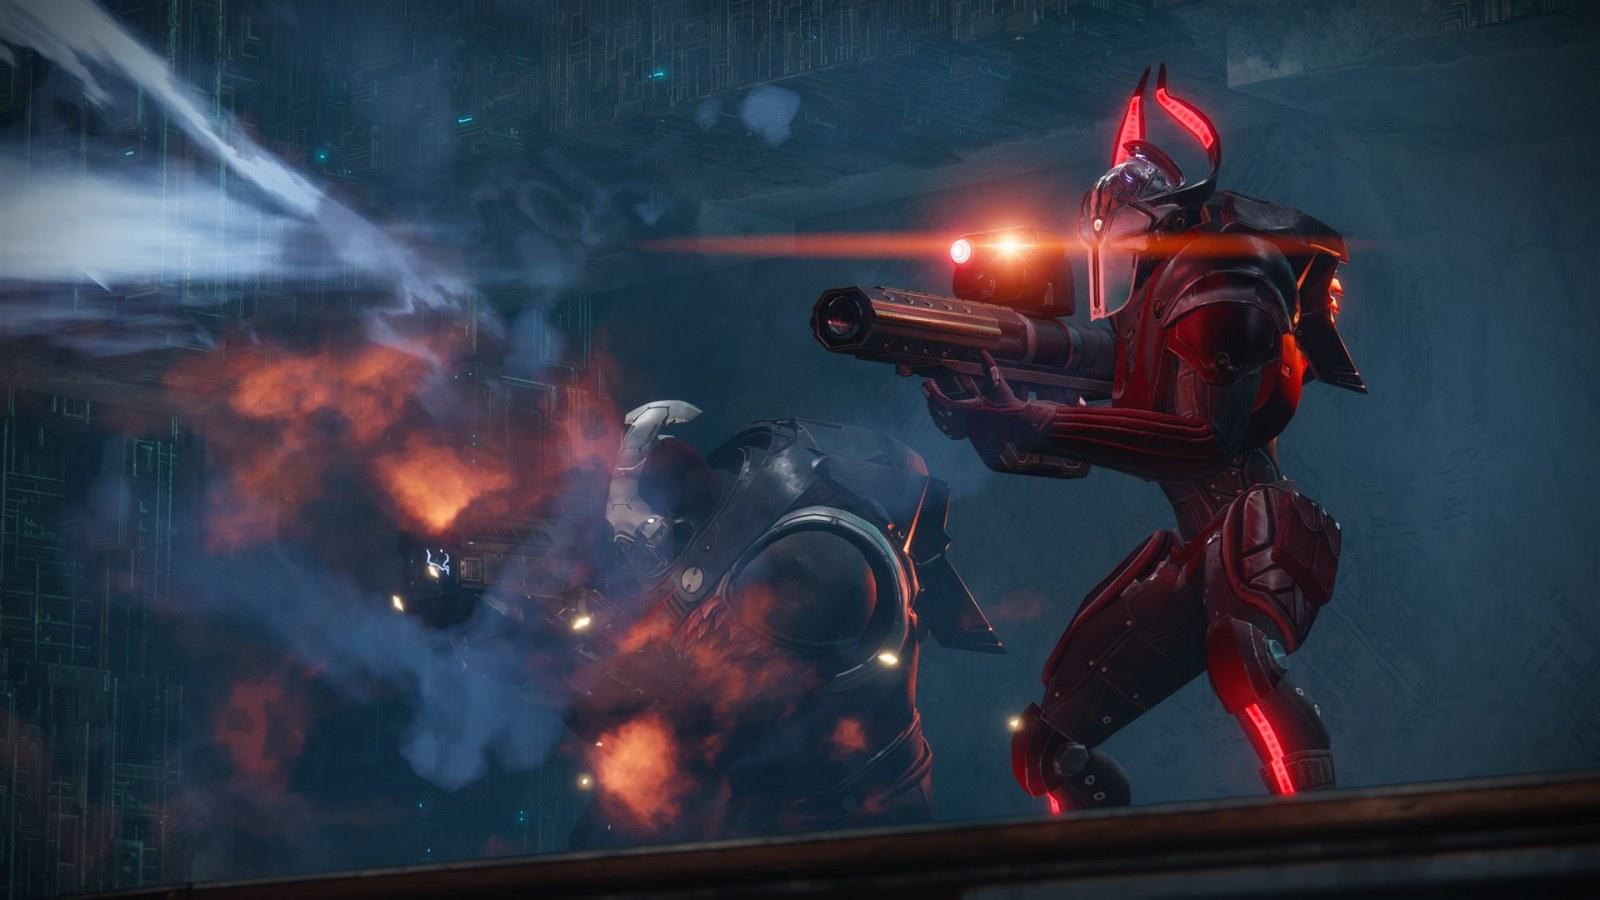 Destiny 2 Update 1 15 1 1 3 Adds Nightfall Scoring Patch Notes